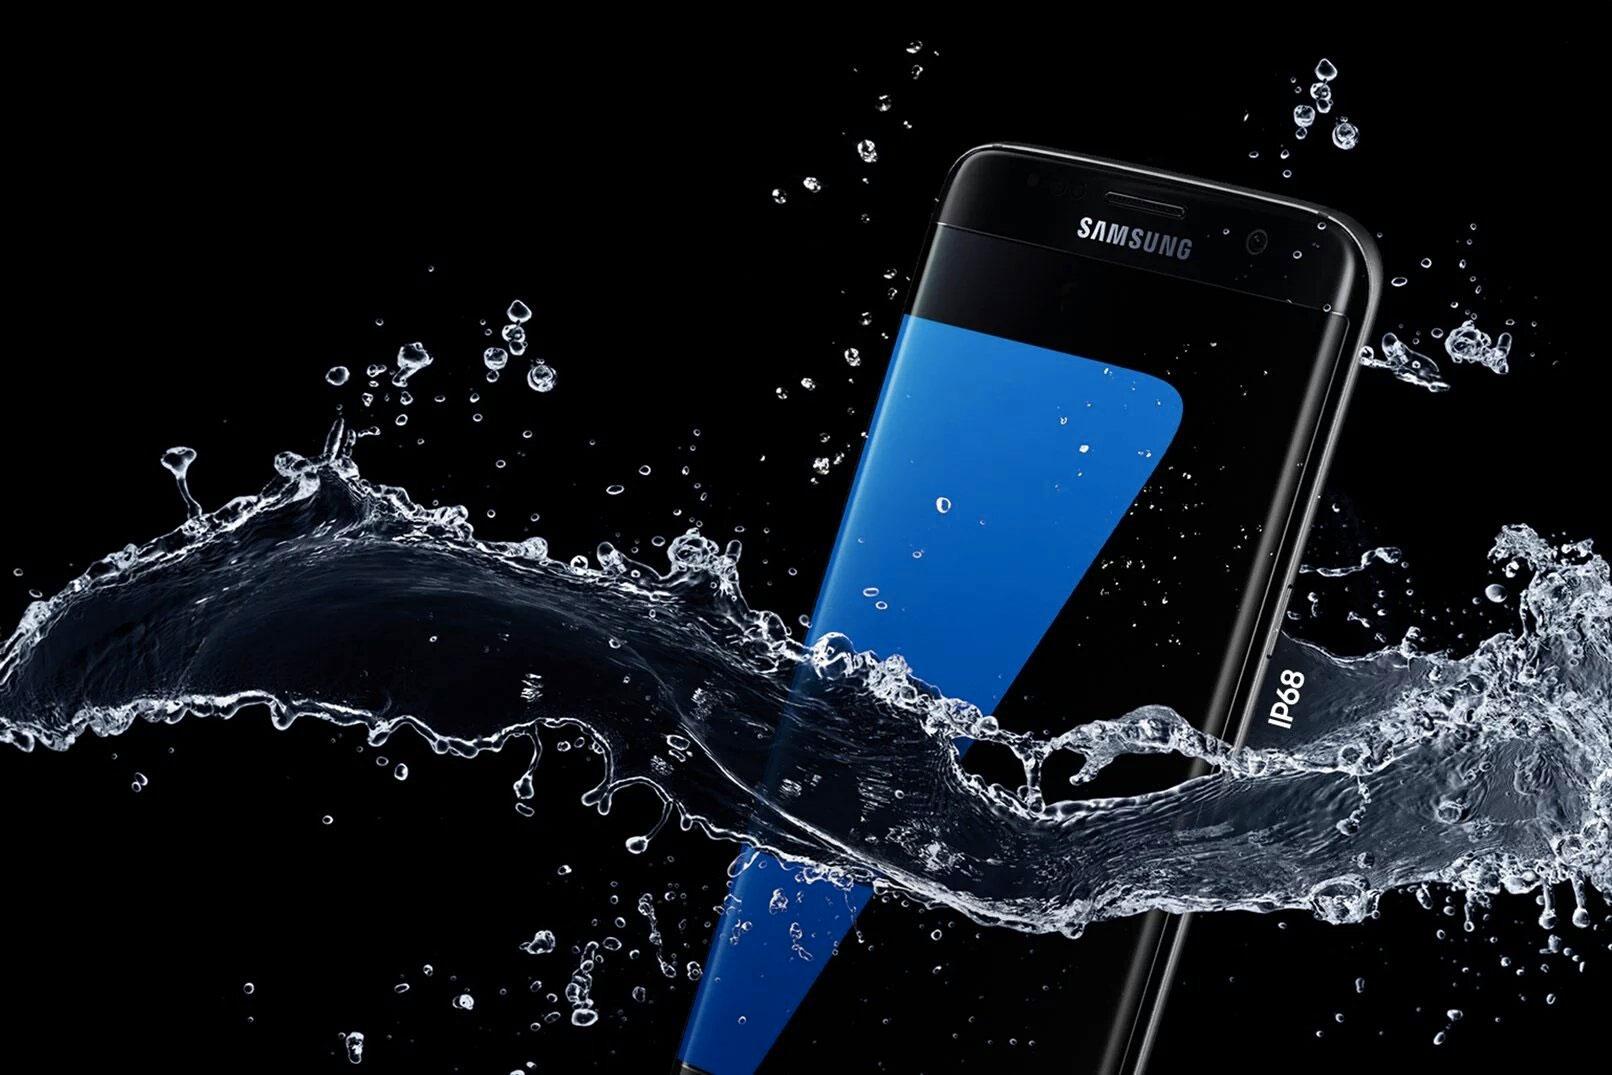 Samsung Galaxy S7, il fait son premier plongeon